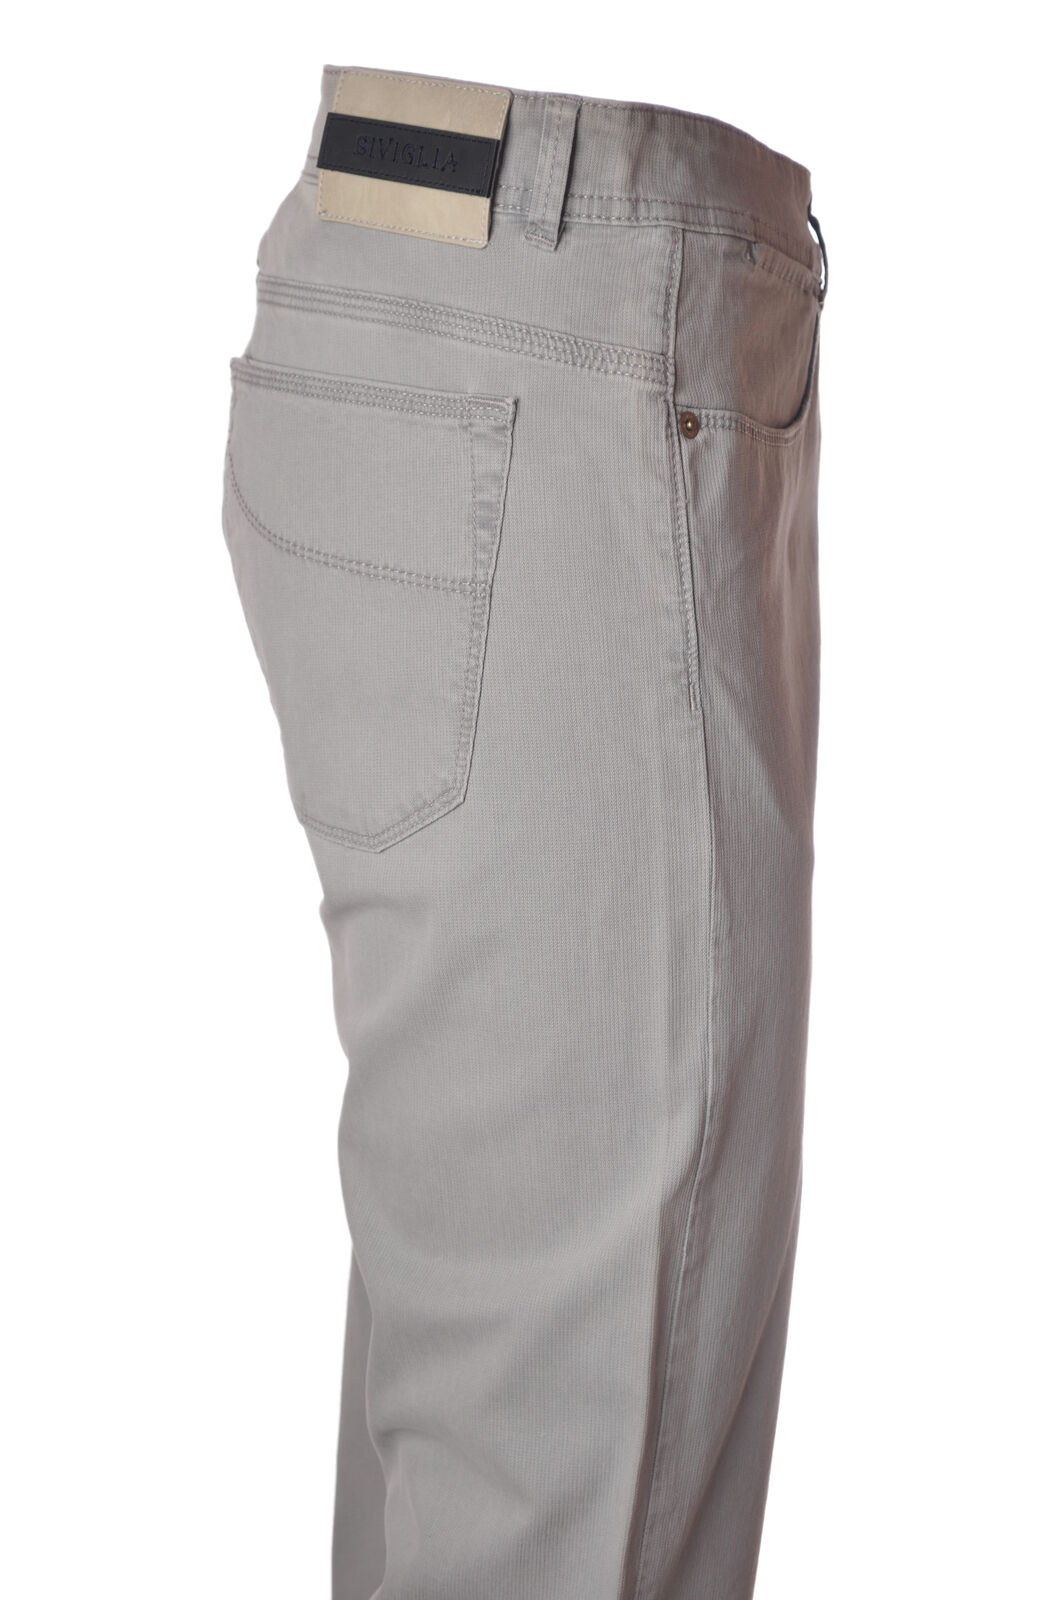 Siviglia - Hose-Hosen - Mann - grey - 4697011M180811